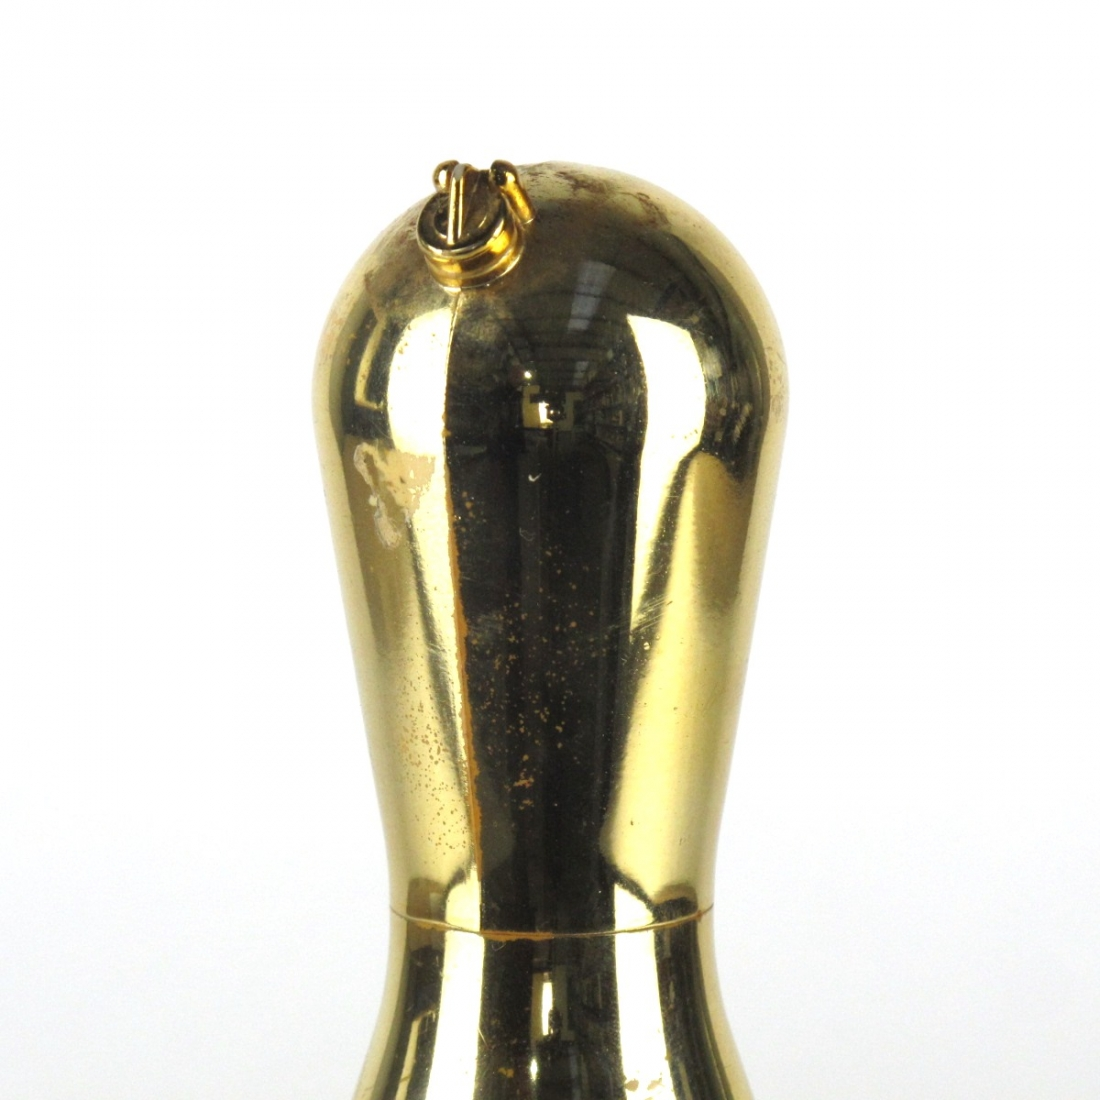 Jim Beam / Beam's Pin Bottle 6 Year Old